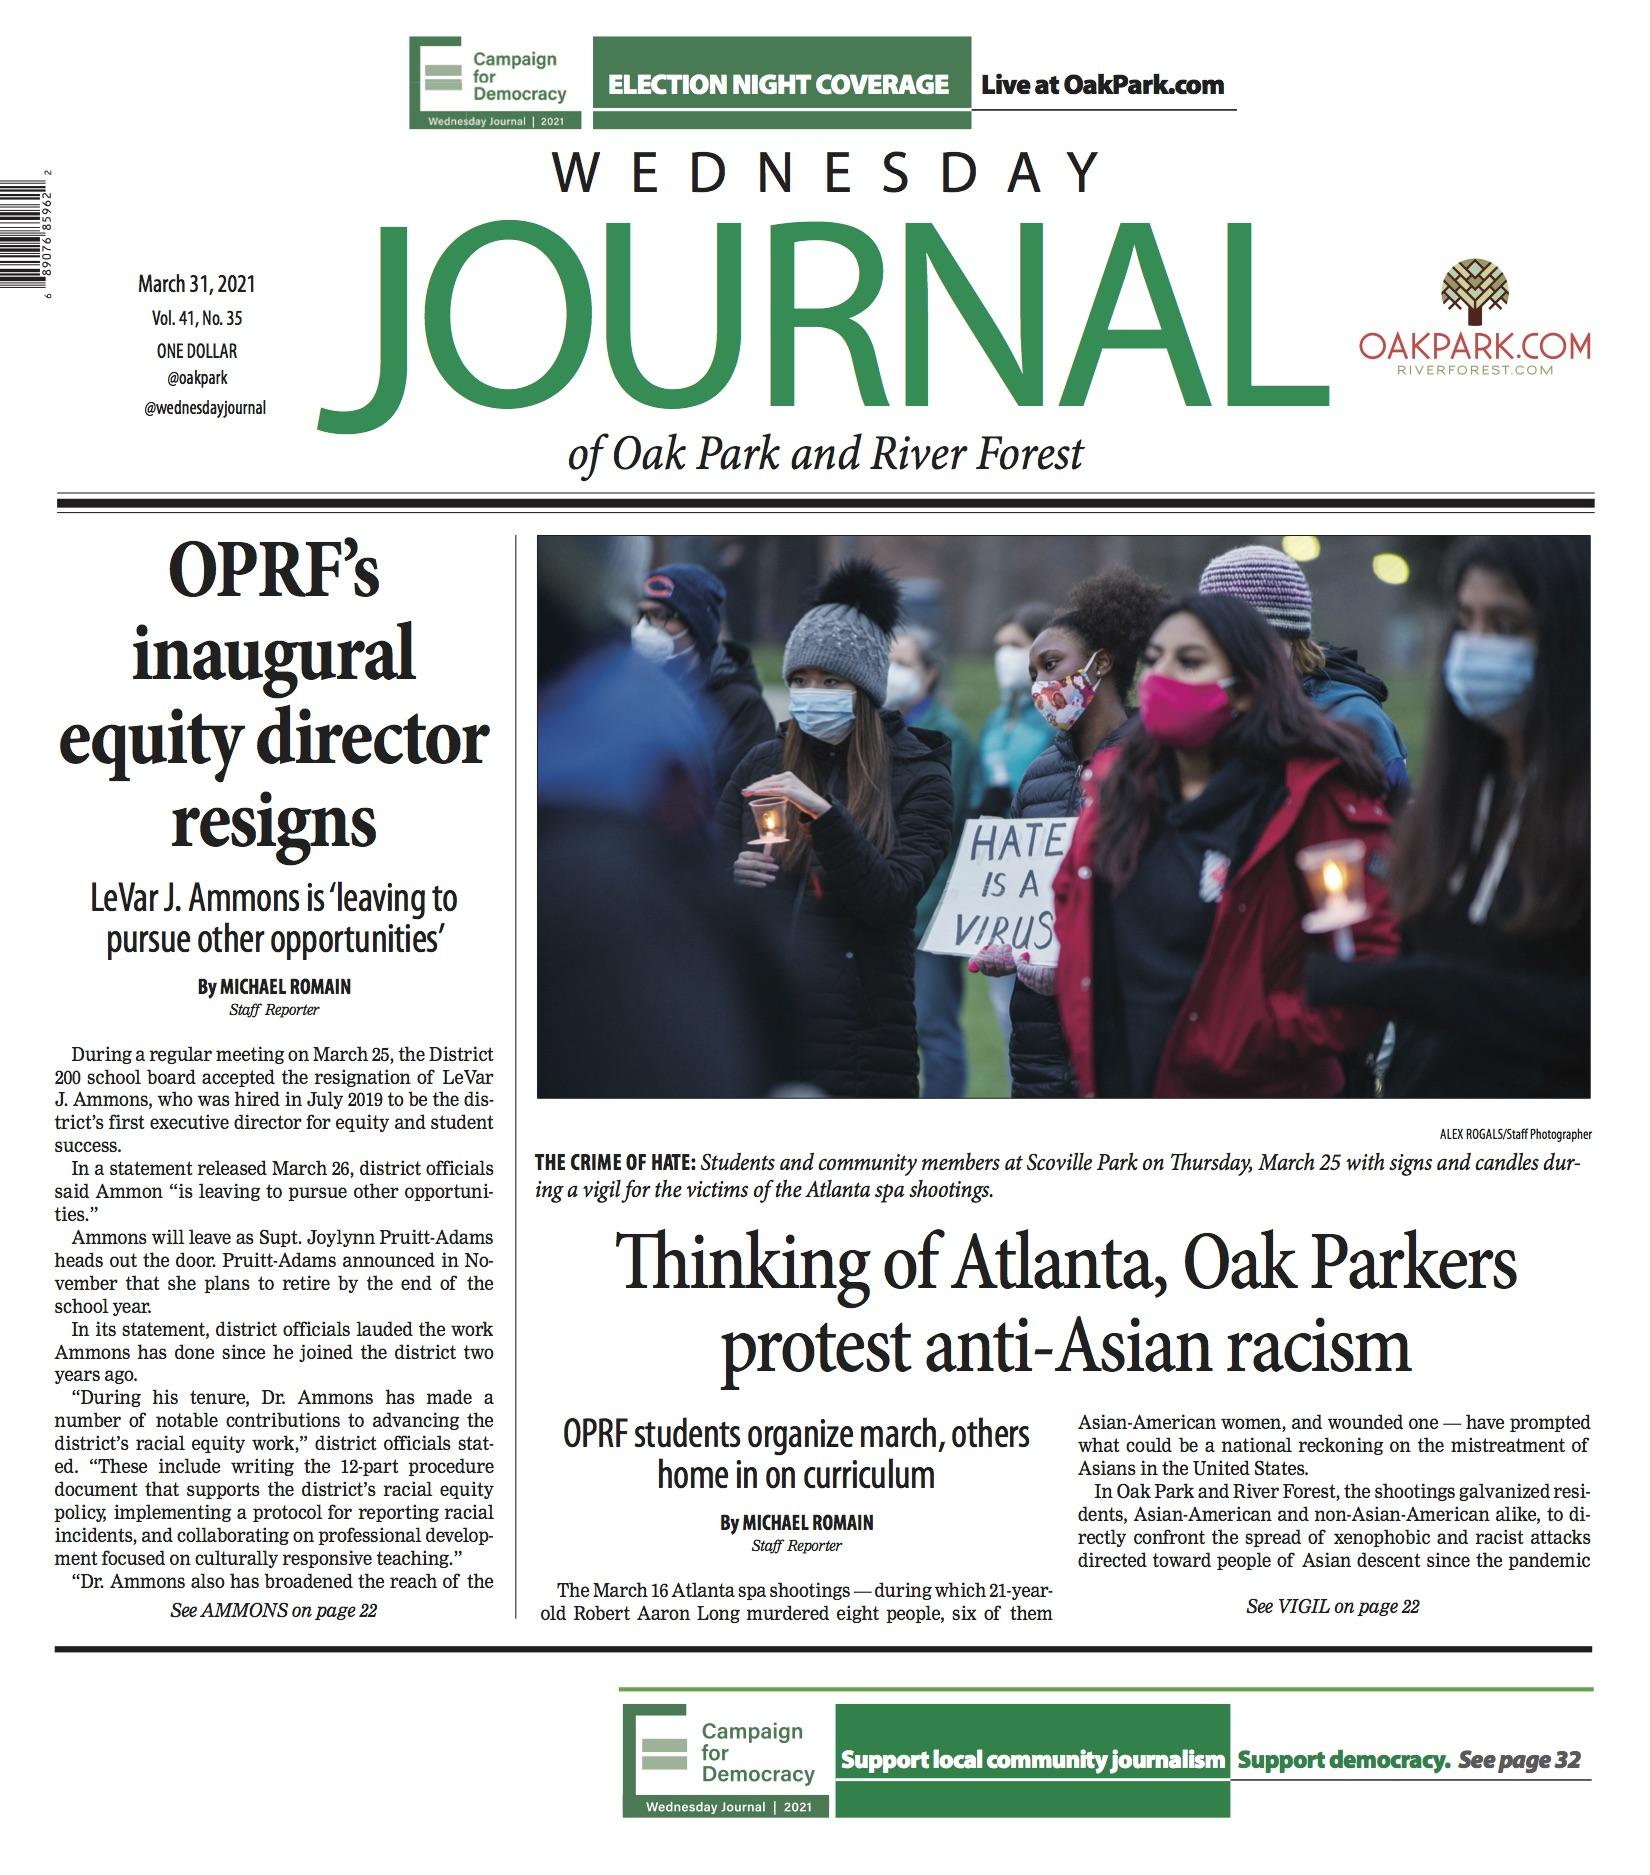 www.oakpark.com: Print Edition: March 31